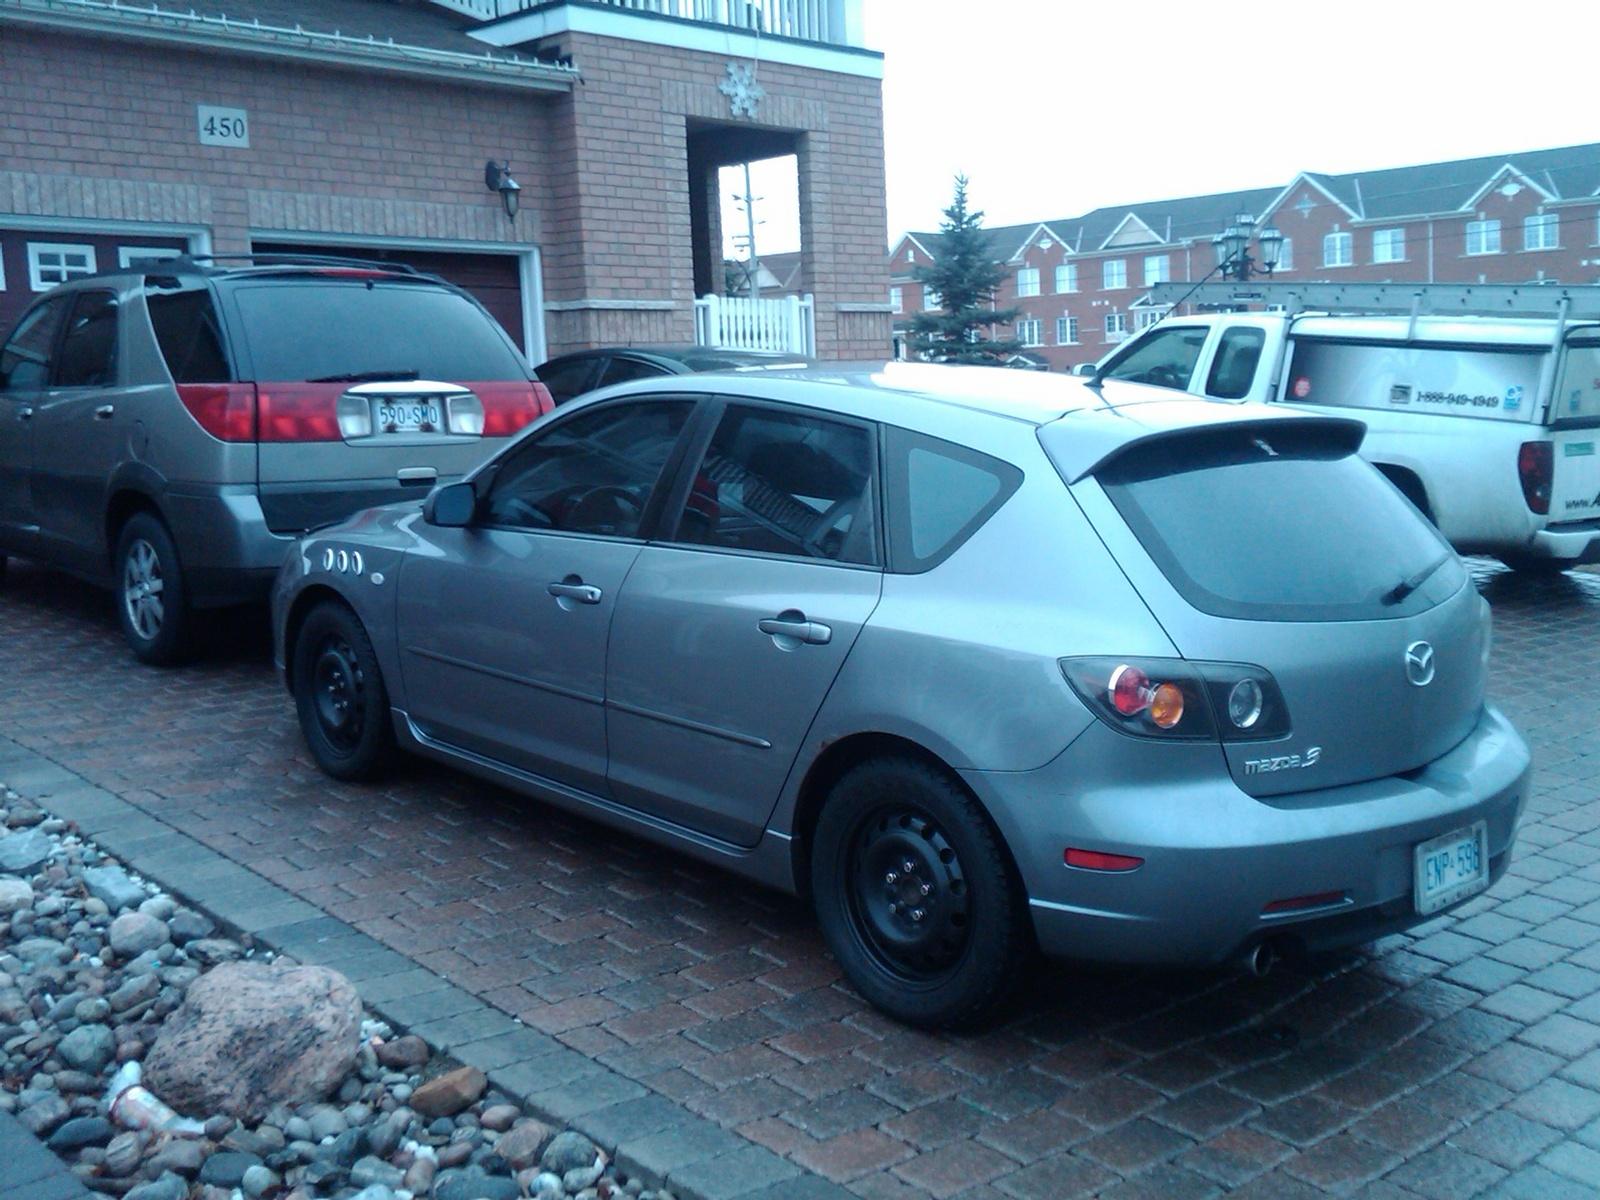 2005 mazda 3 hatchback reliability